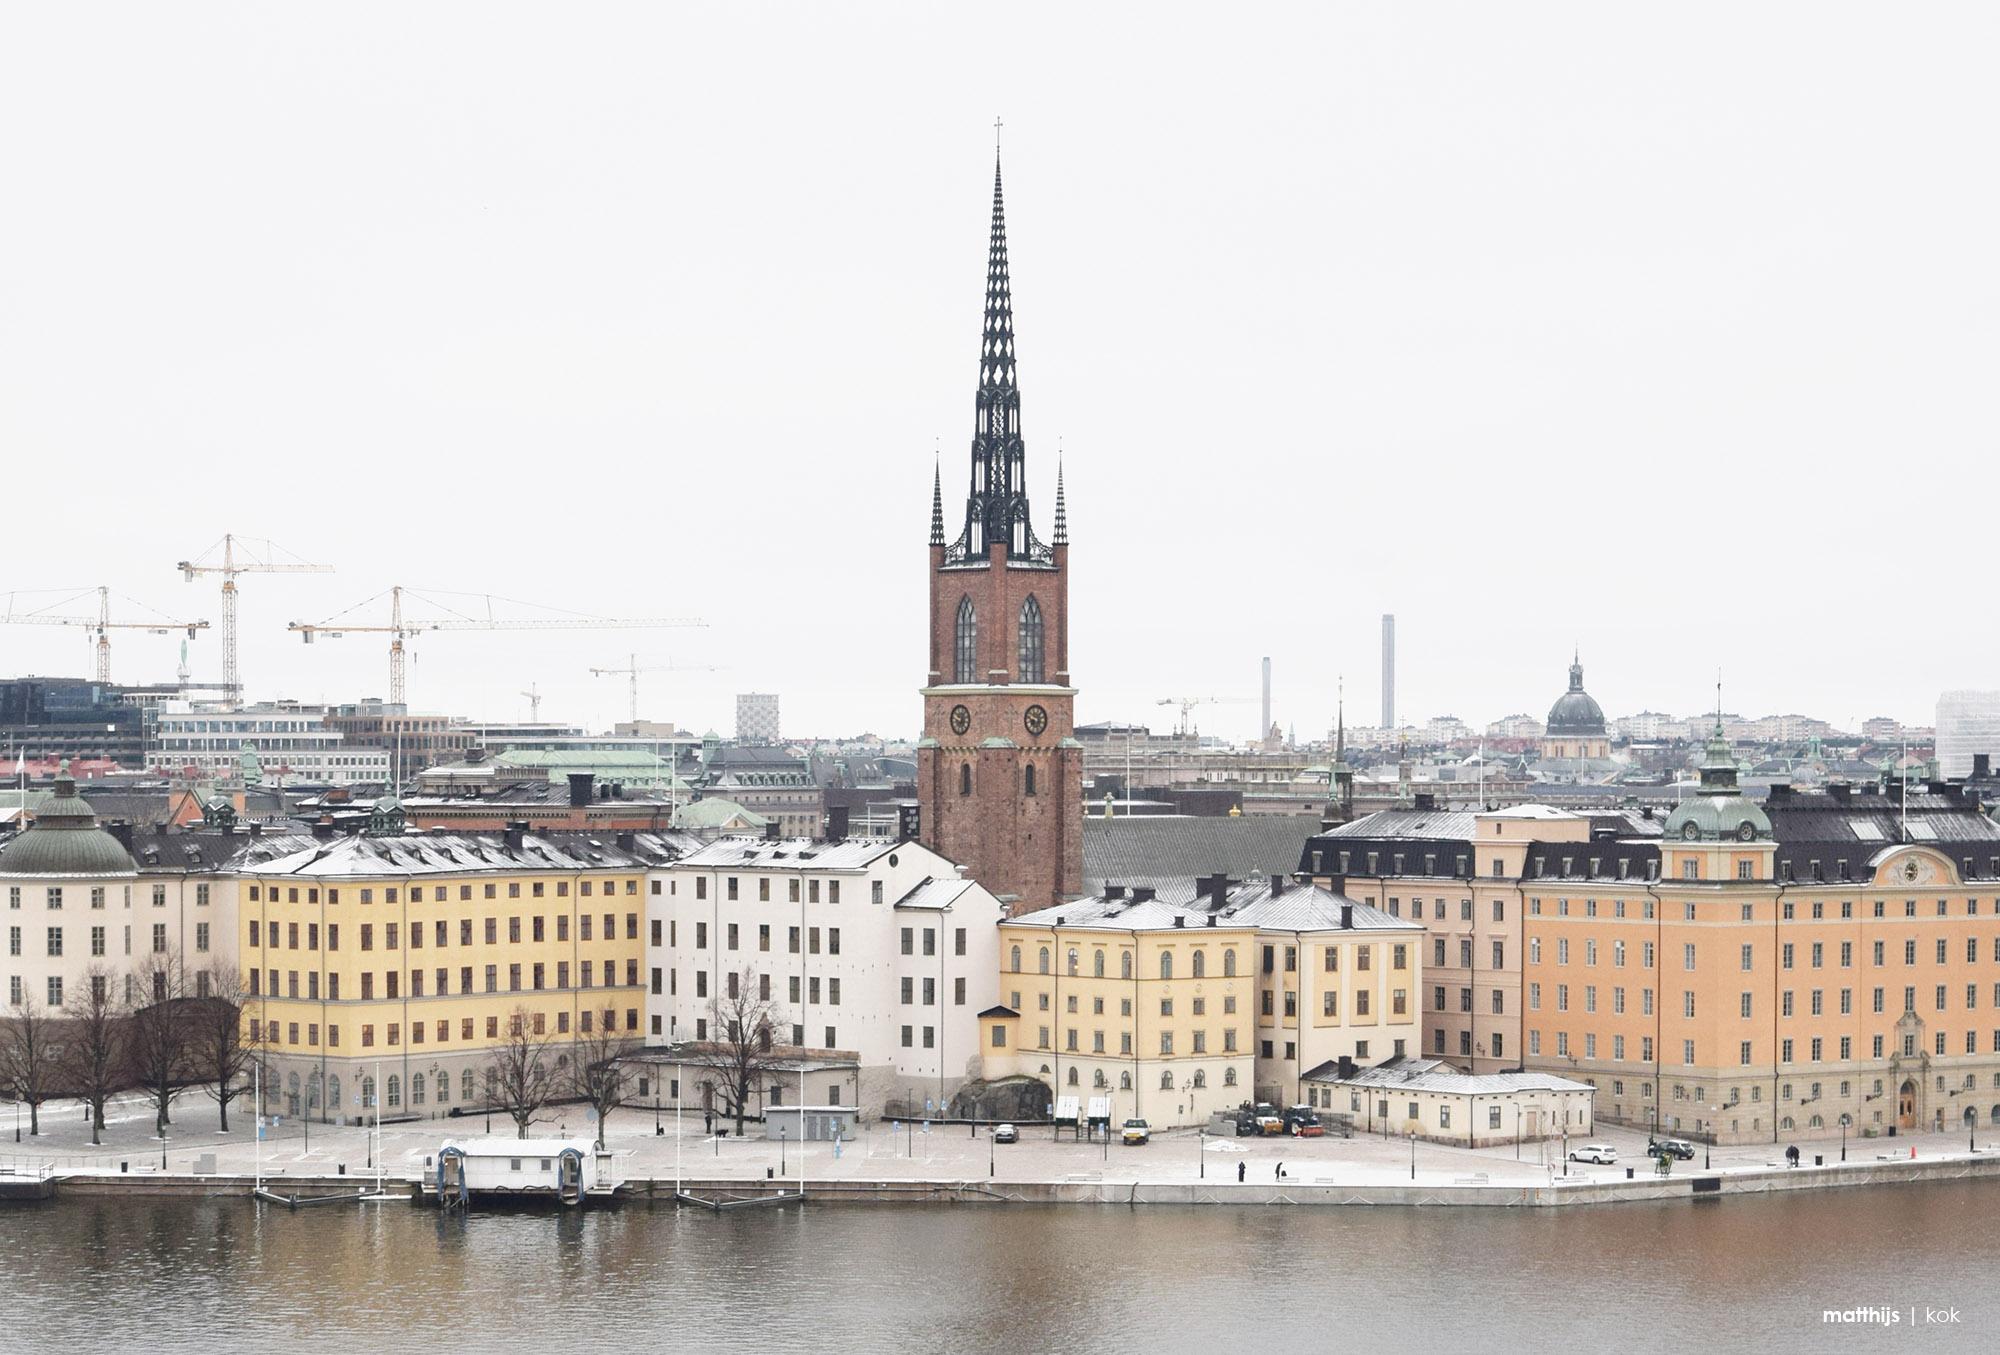 Monteliusvägen, Stockholm, Sweden | Photo by Matthijs Kok